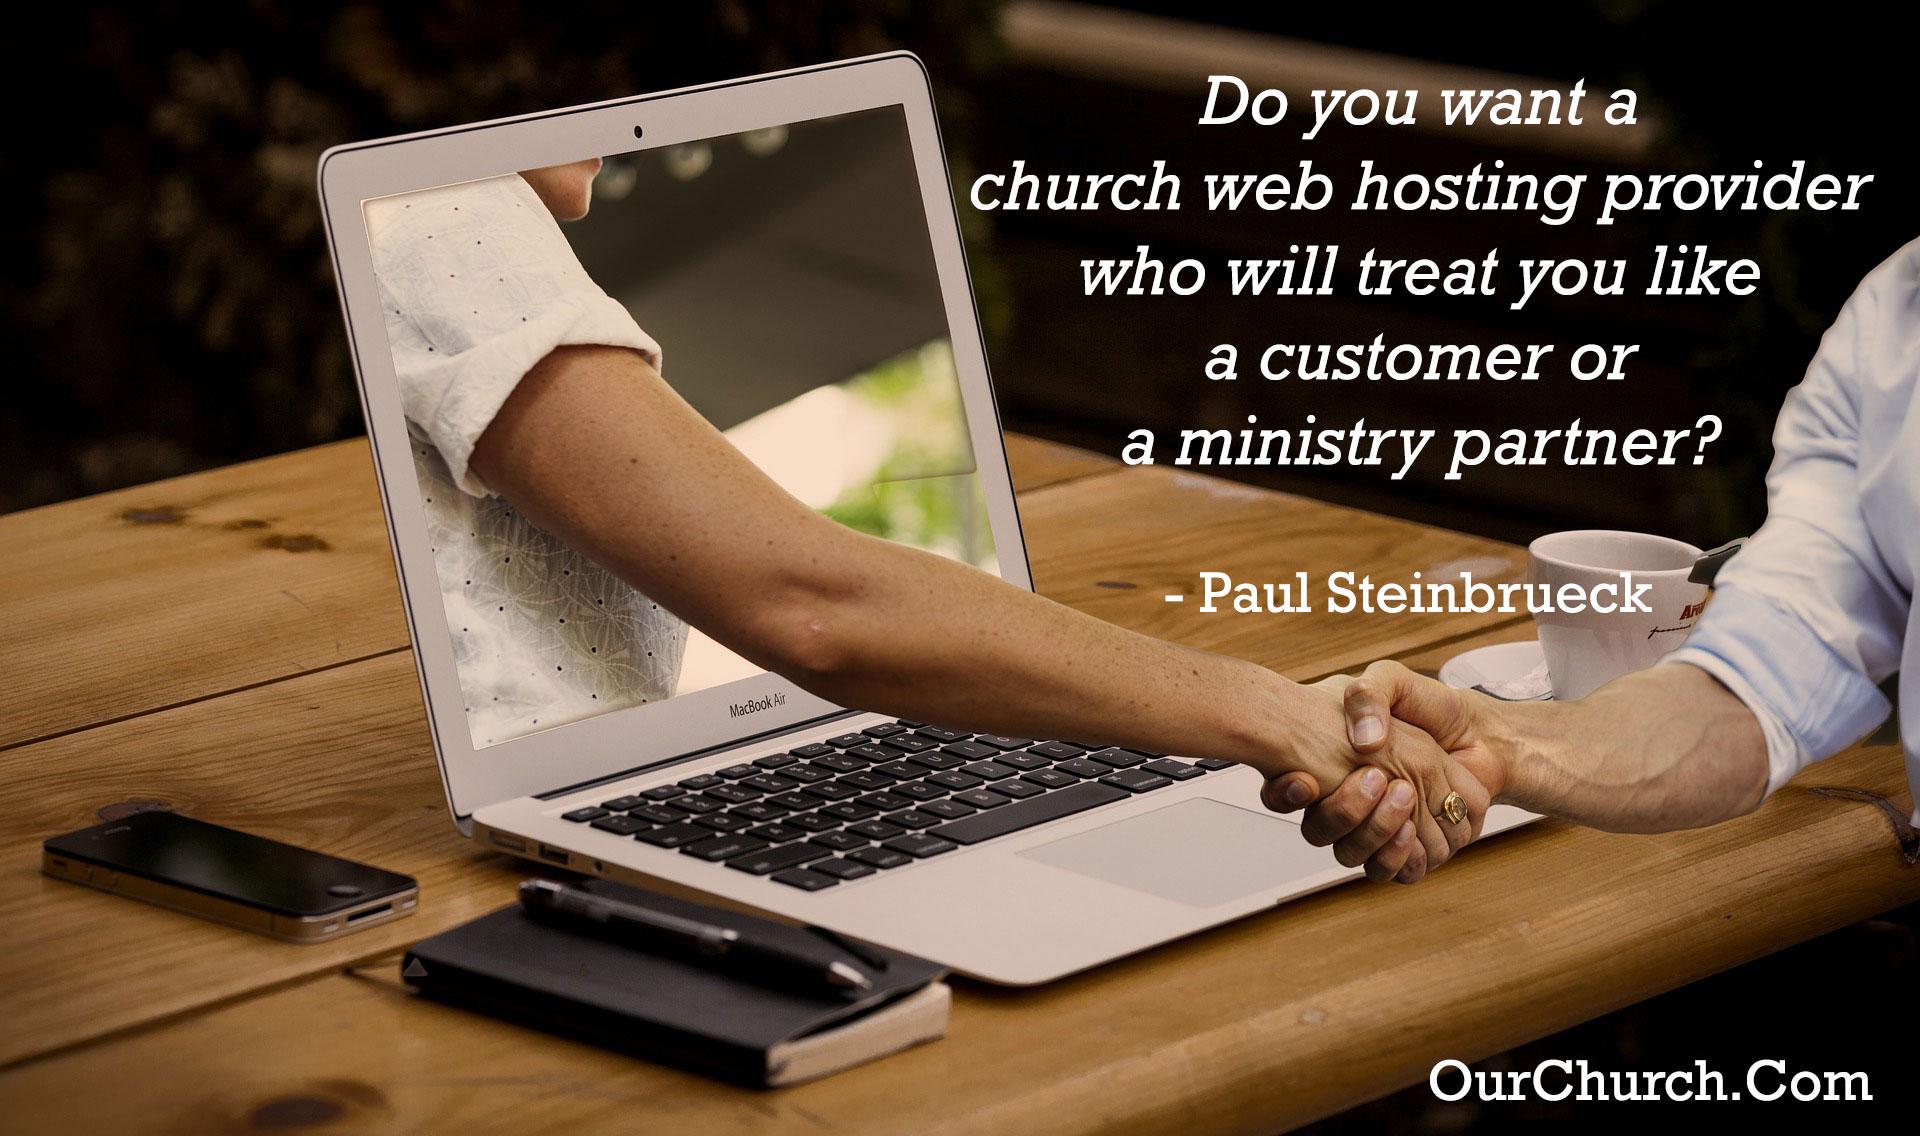 church web hosting - Christian ministry partner